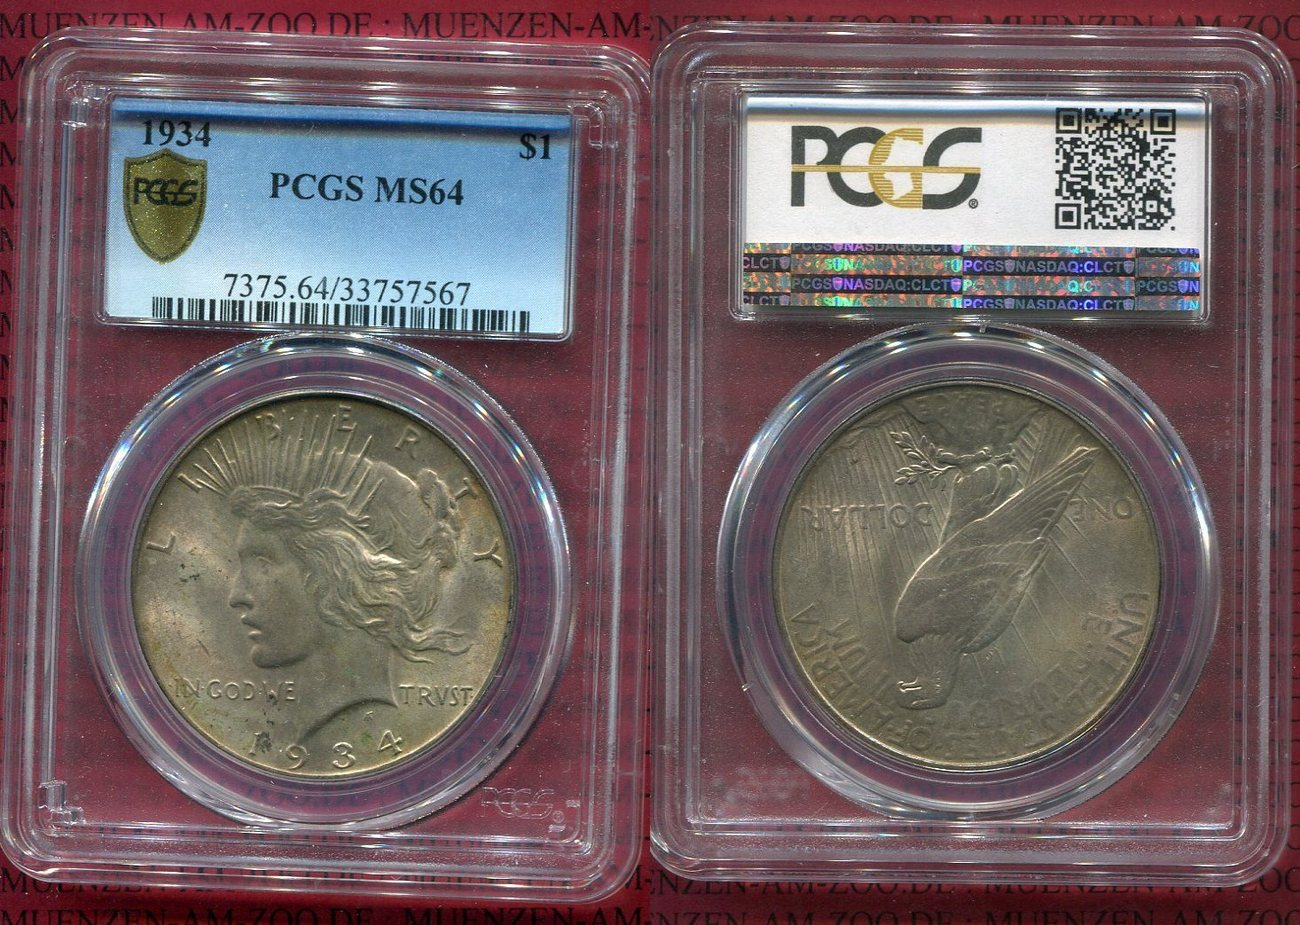 1 Dollar Silbermünze 1934 Usa Peace Typ